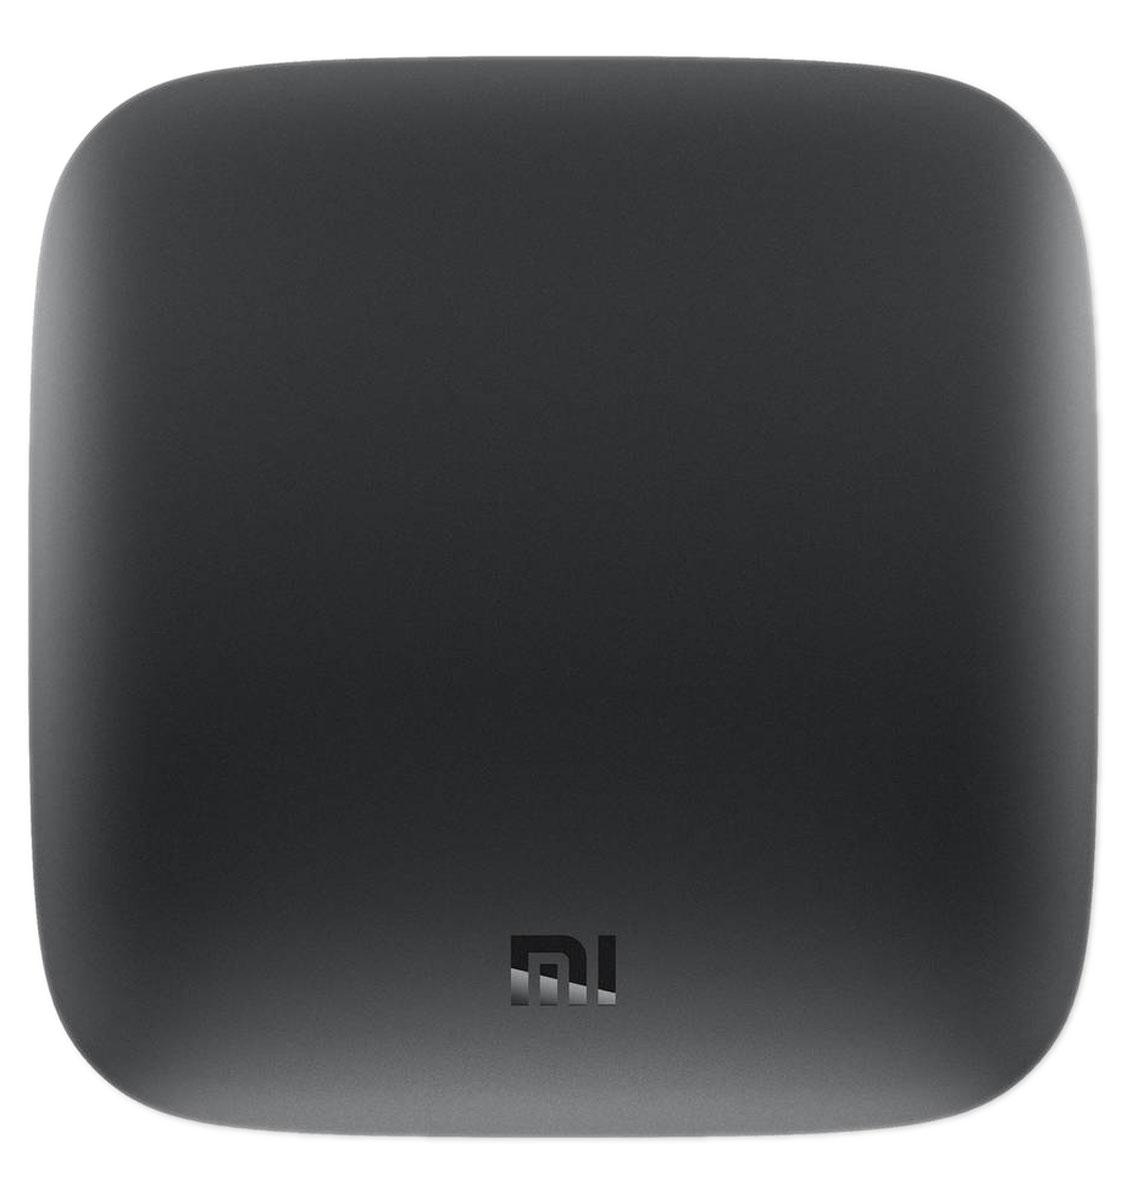 лучшая цена Медиаплеер Xiaomi Mi Box International Version (MDZ-16-AB)